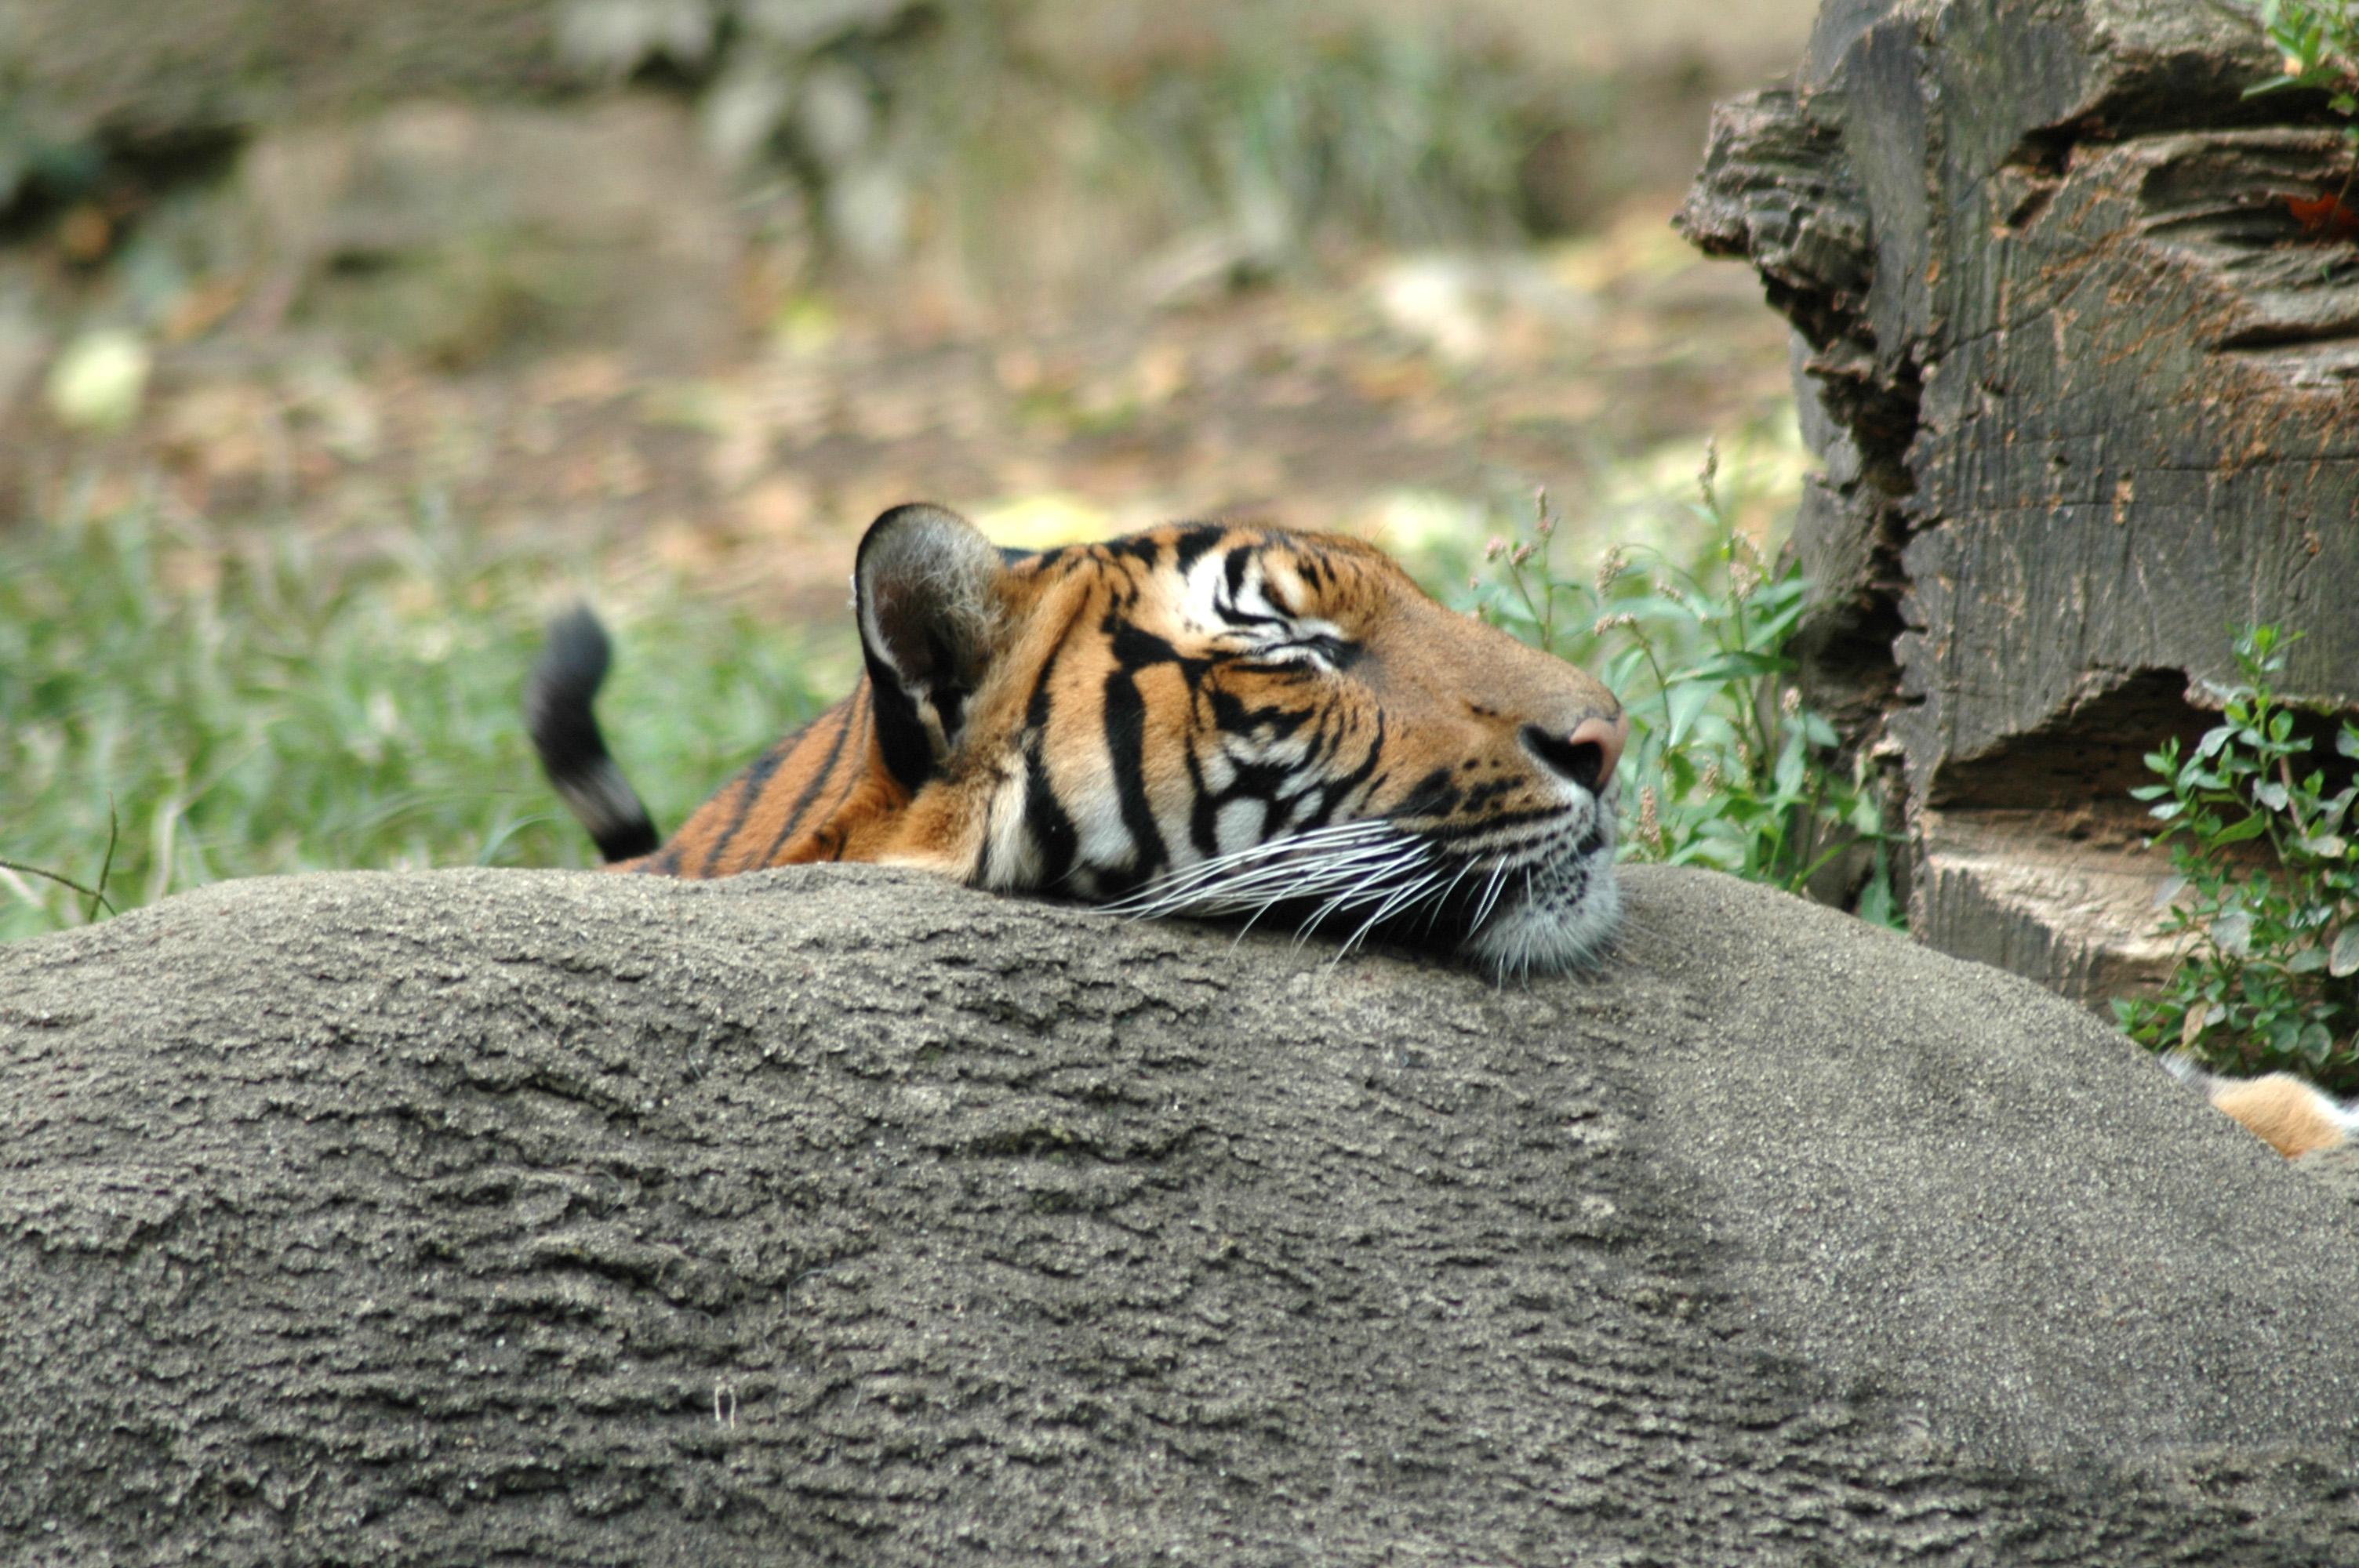 A tiger at Cincinnati Zoo & Botanical Gardens rests on a log.